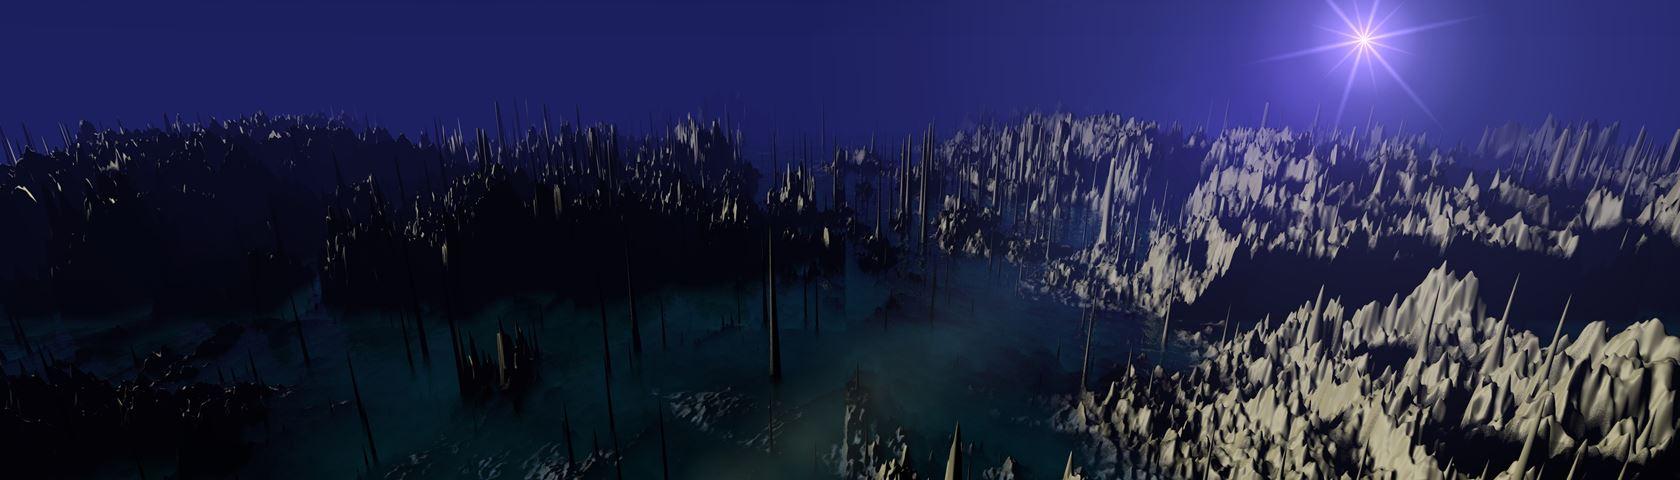 Planet Carina 2